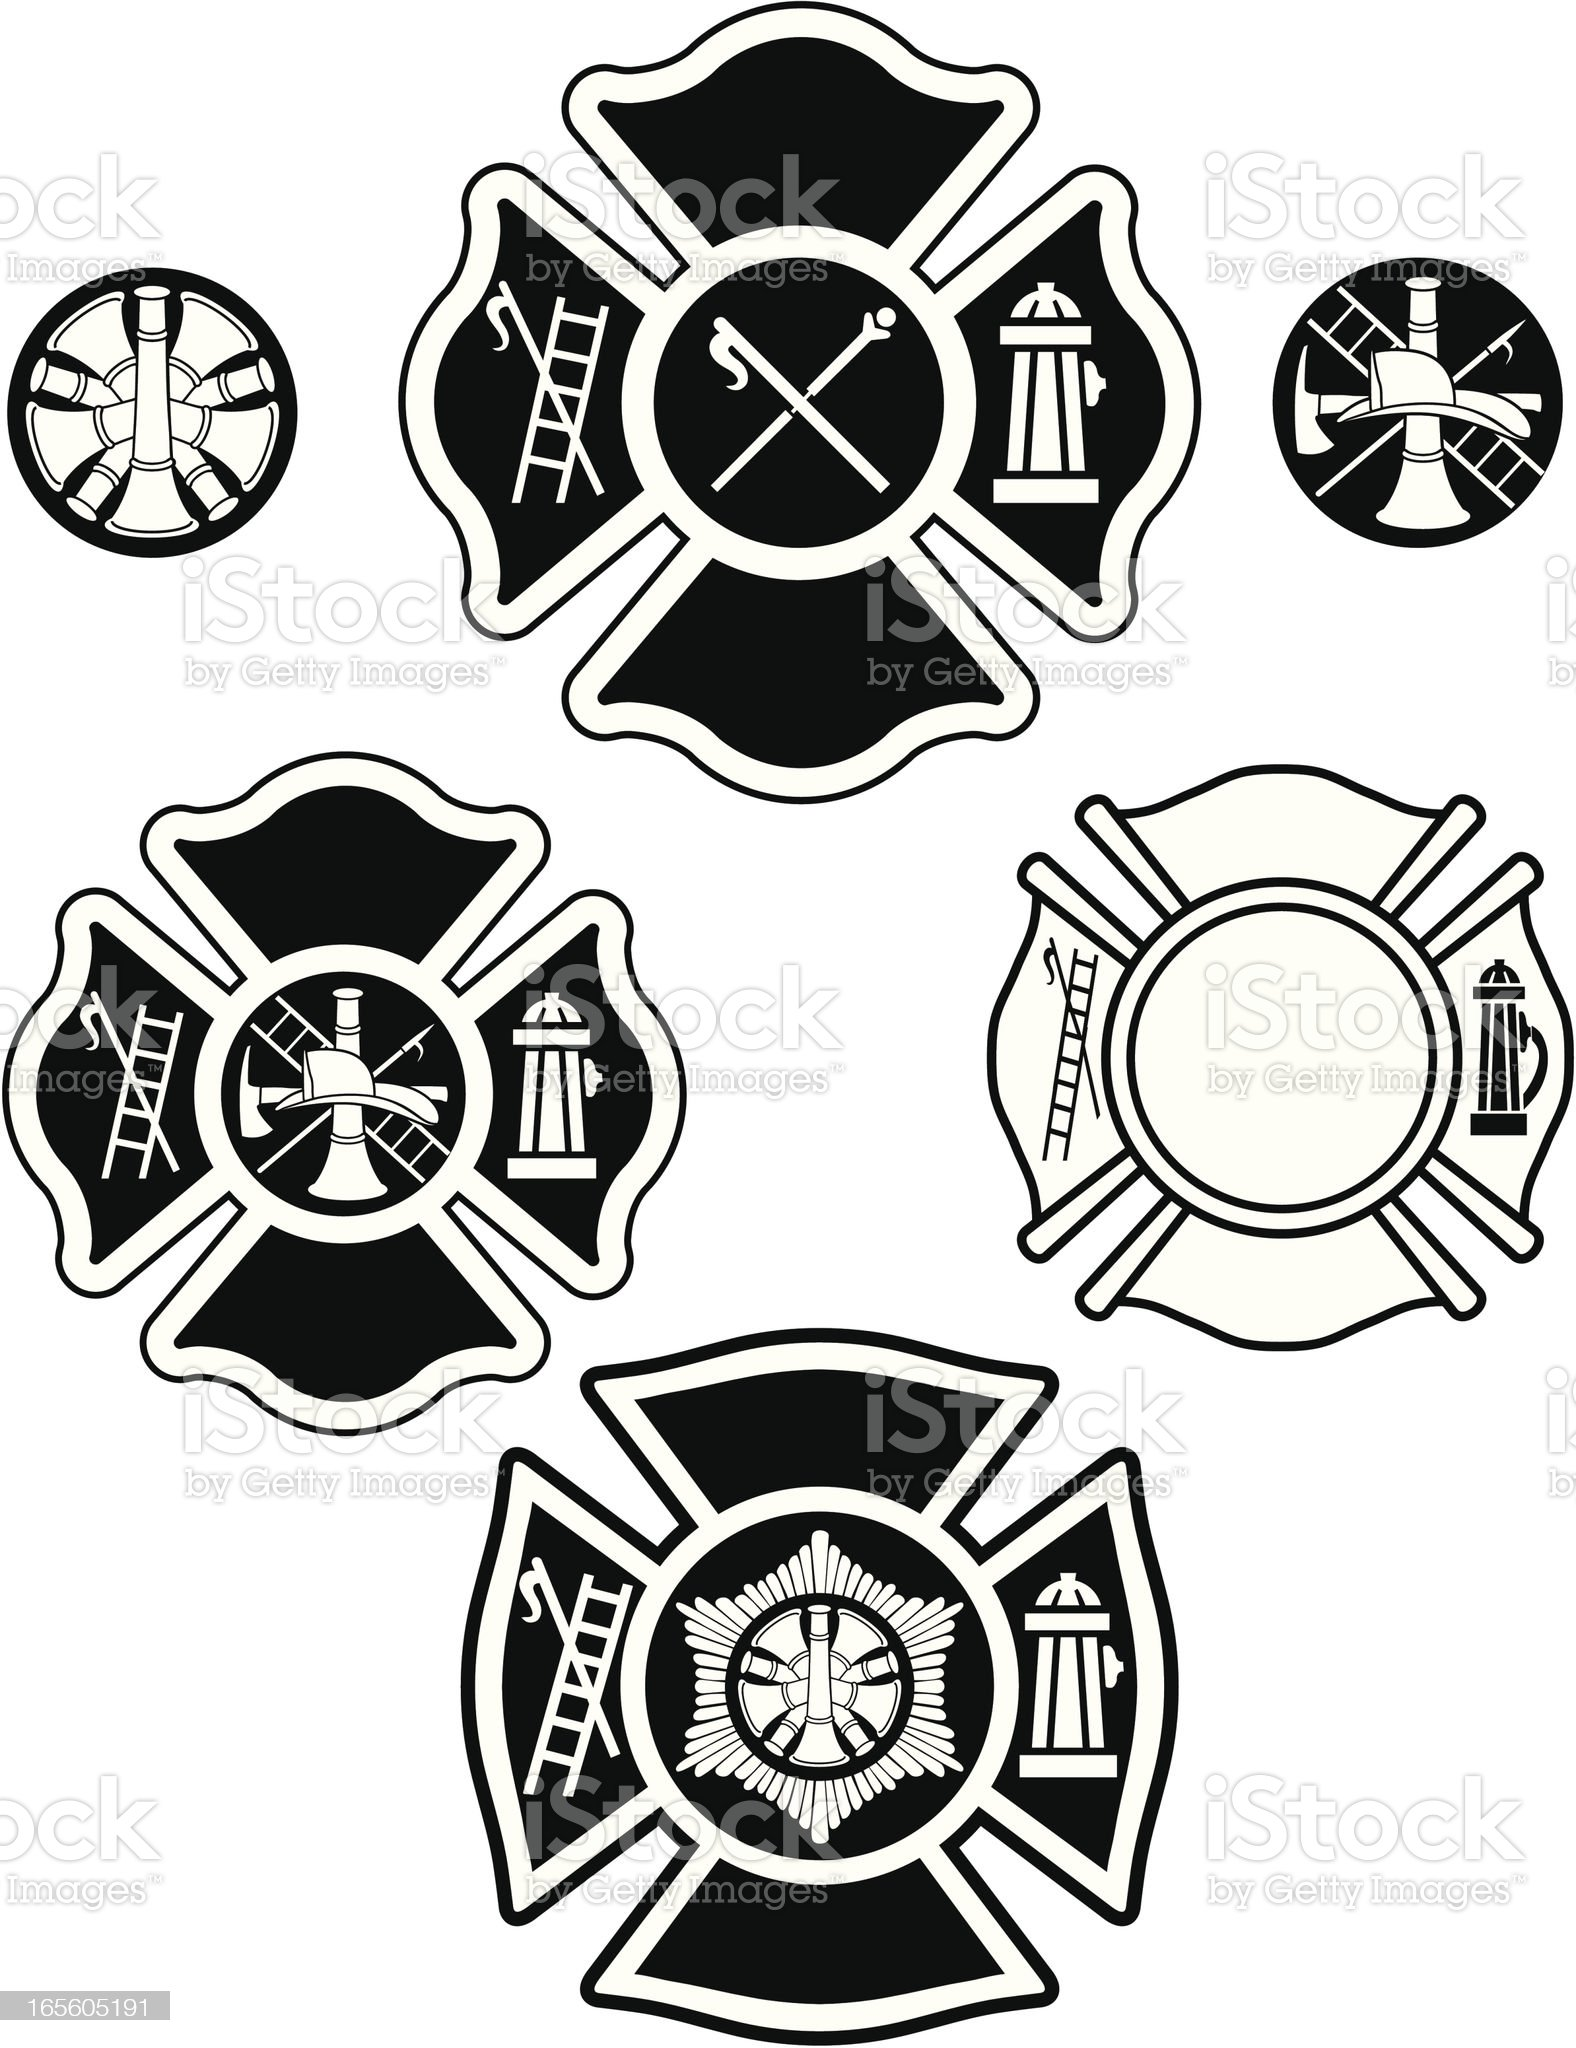 fire department emblems royalty-free stock vector art